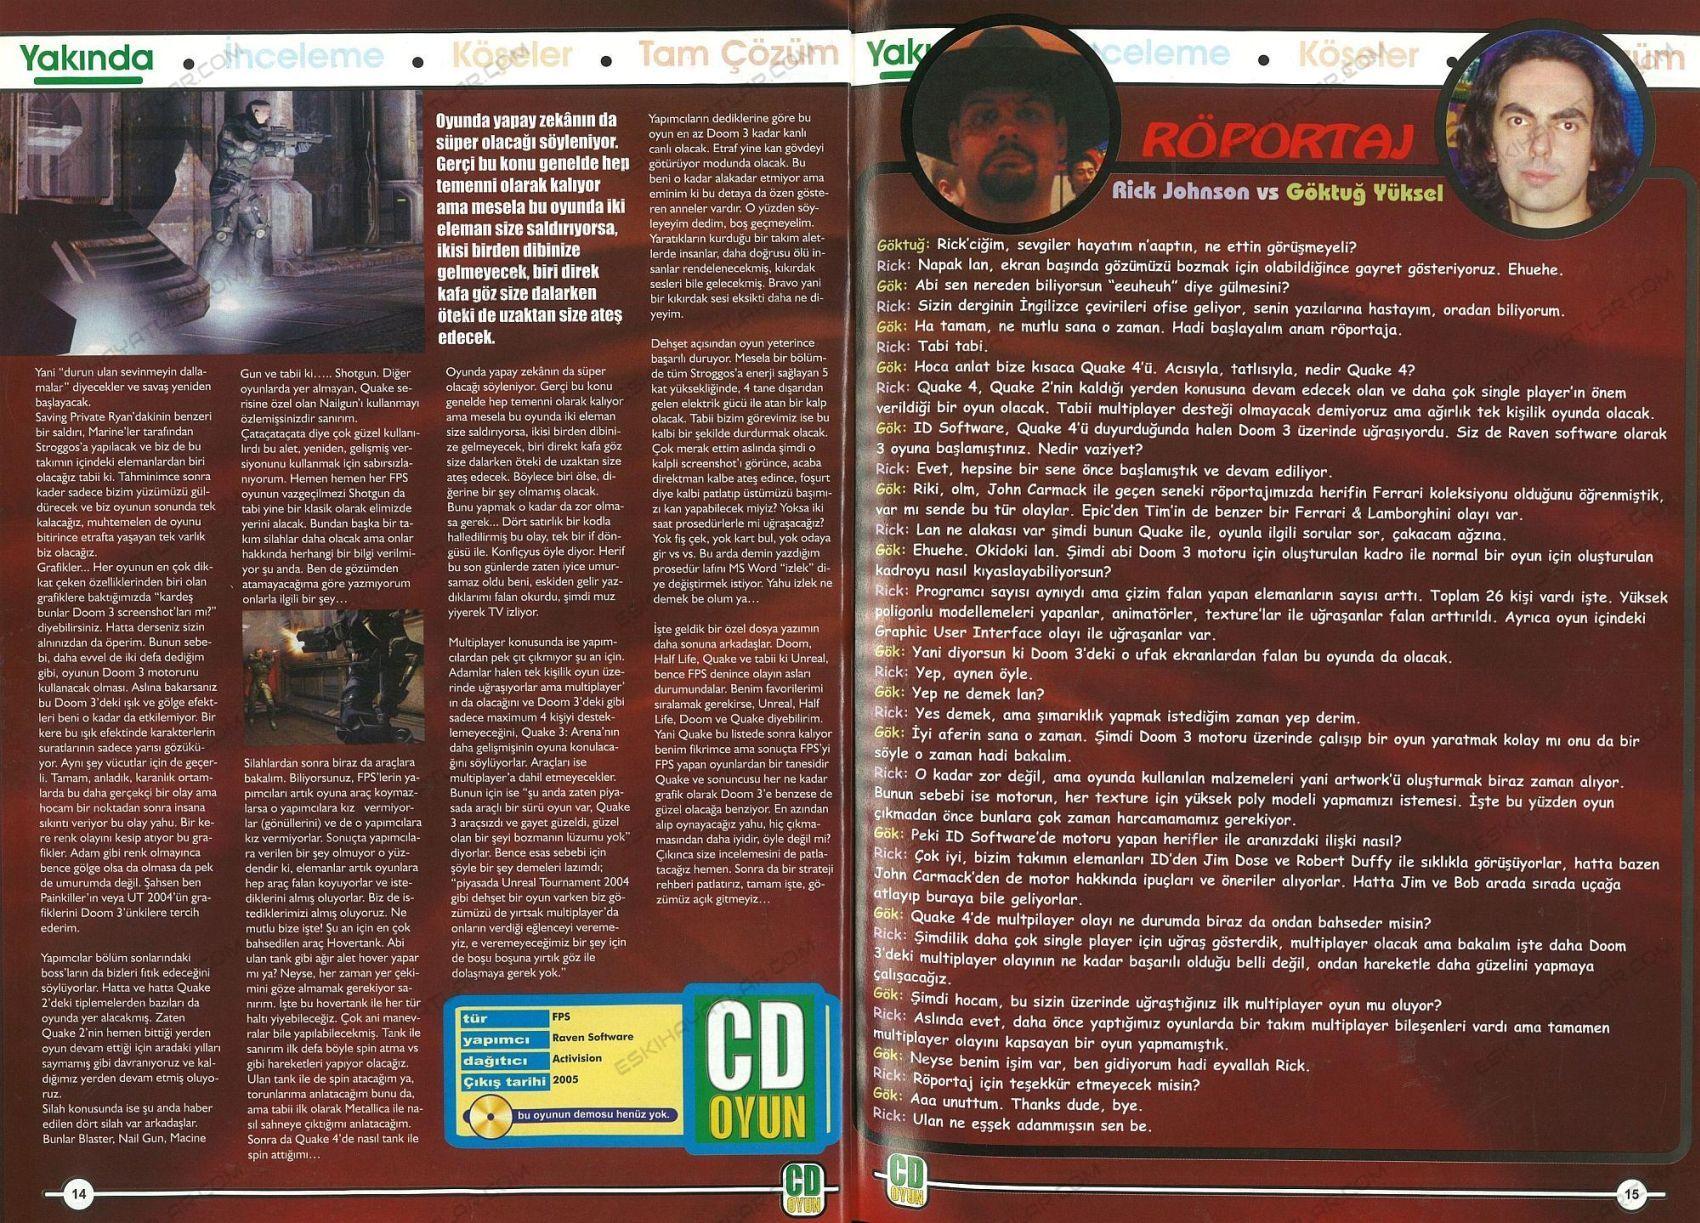 0432-cd-oyun-arsivi-quake-4-oyun-incelemesi-activision-eski-oyunlar (2)